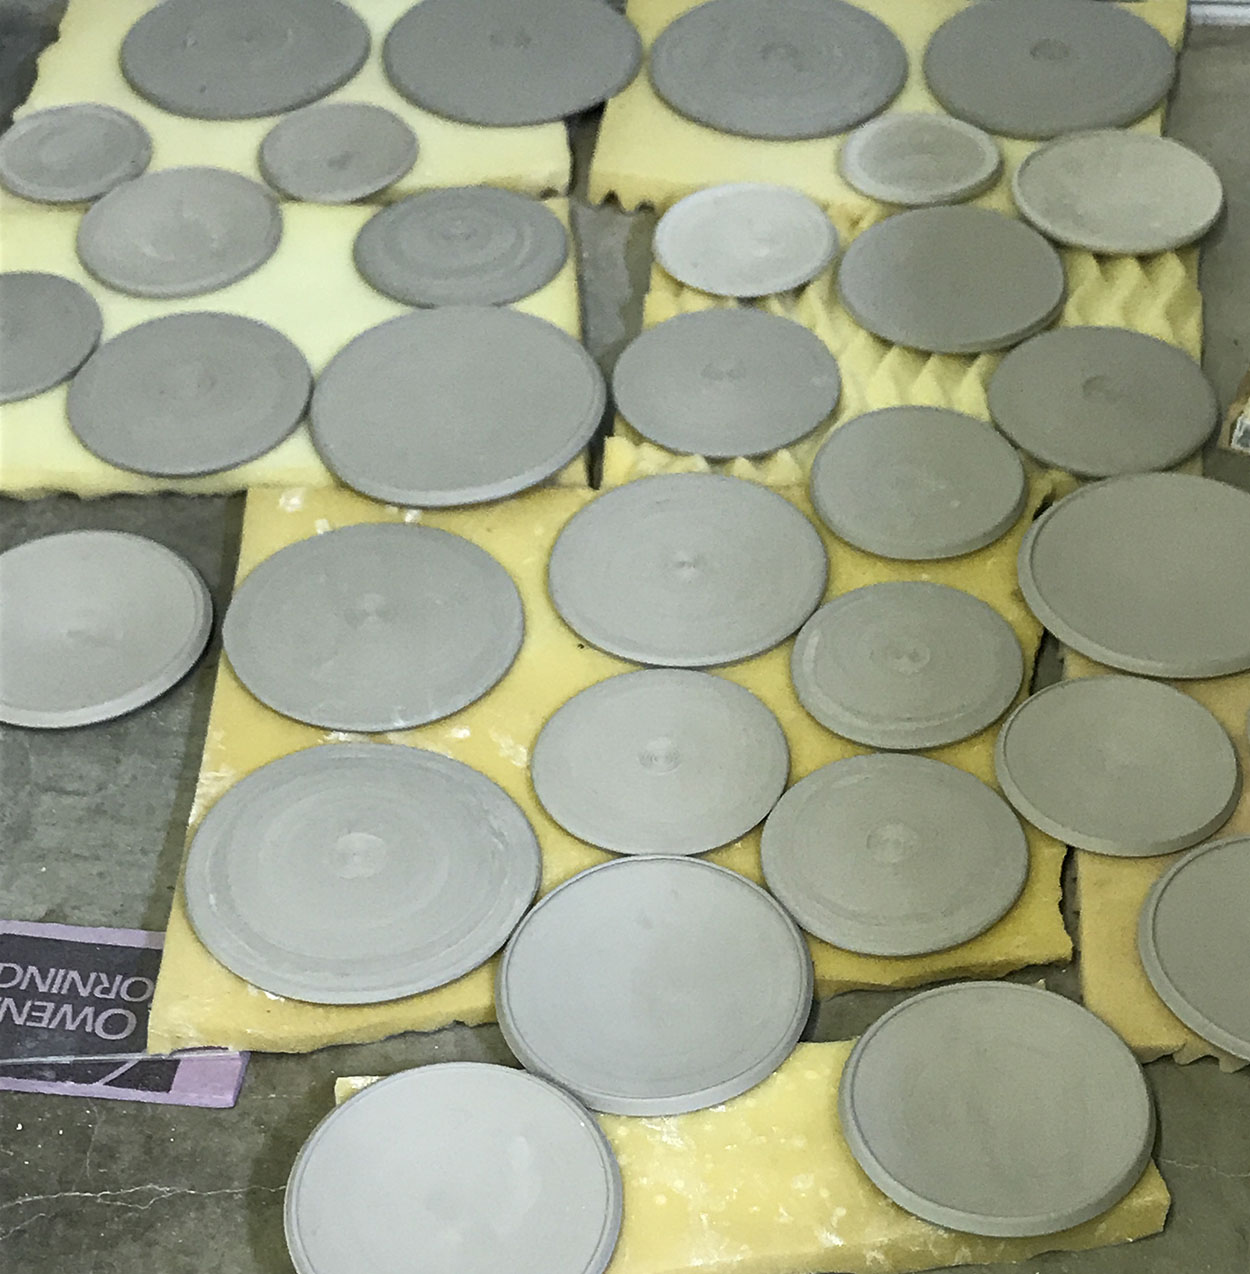 disks on floor.jpg